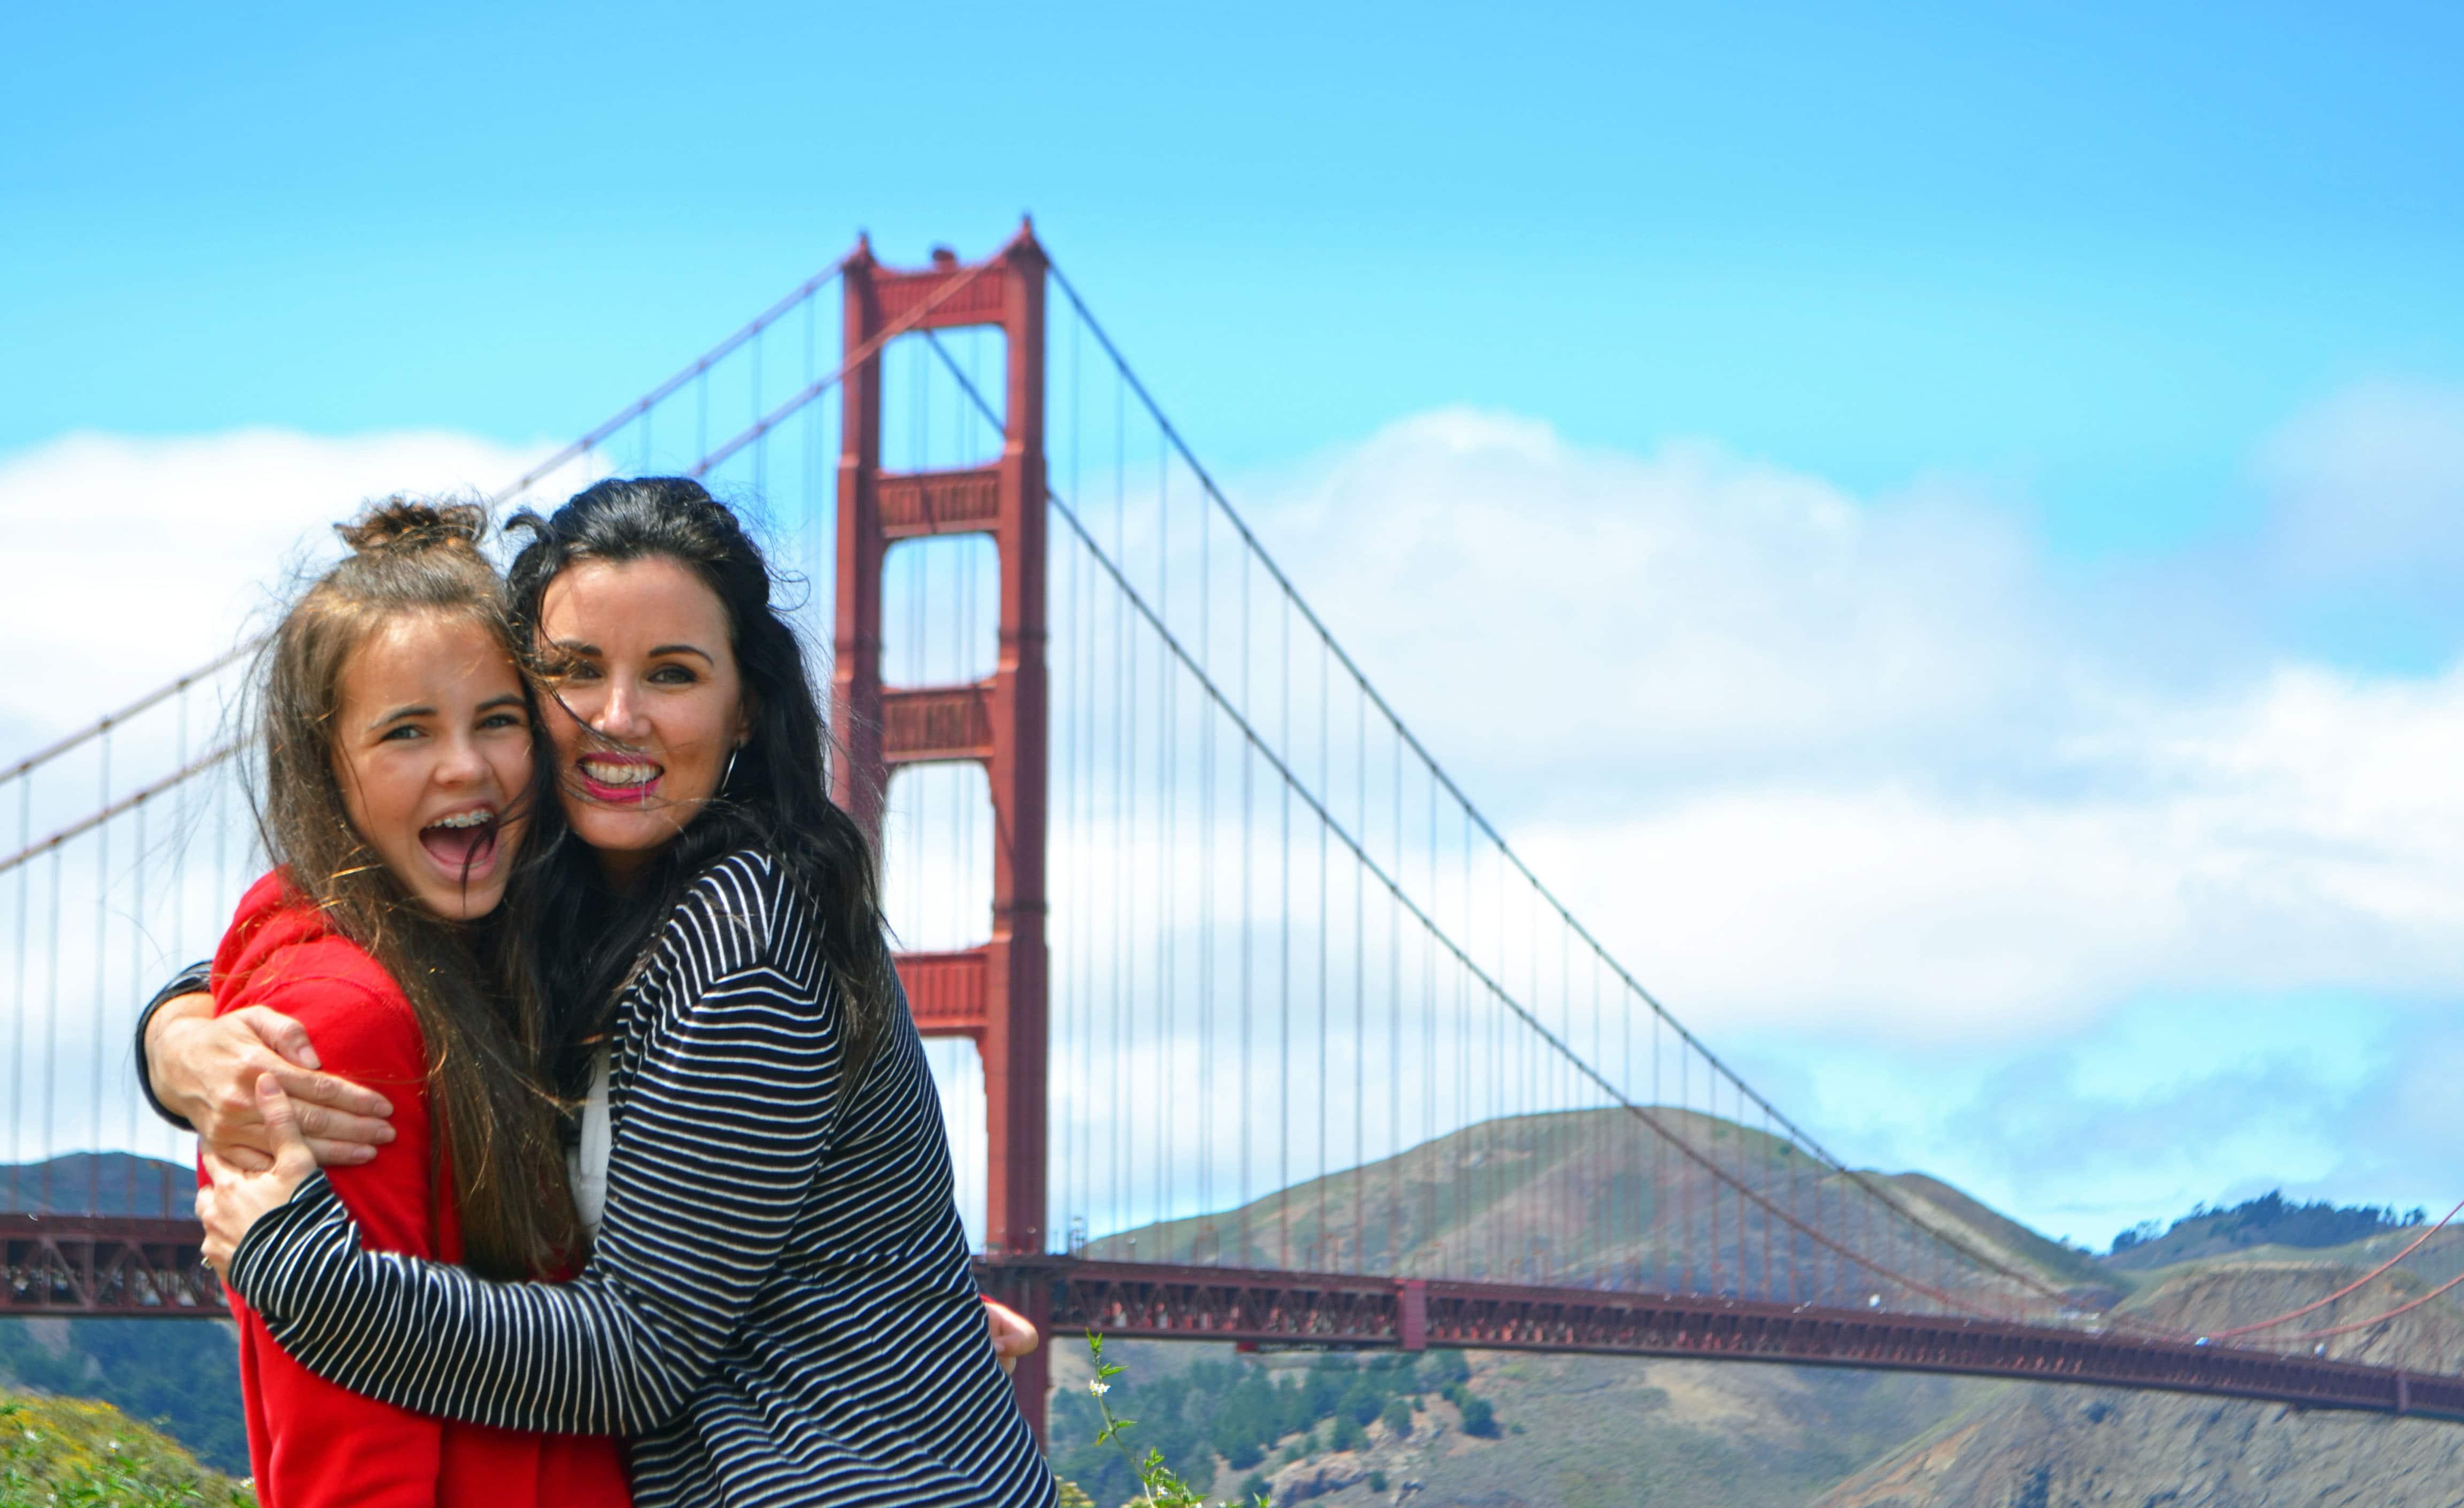 Golden Gate Bridge San Francisco California Pacific Coast Highway 1 Road Trip